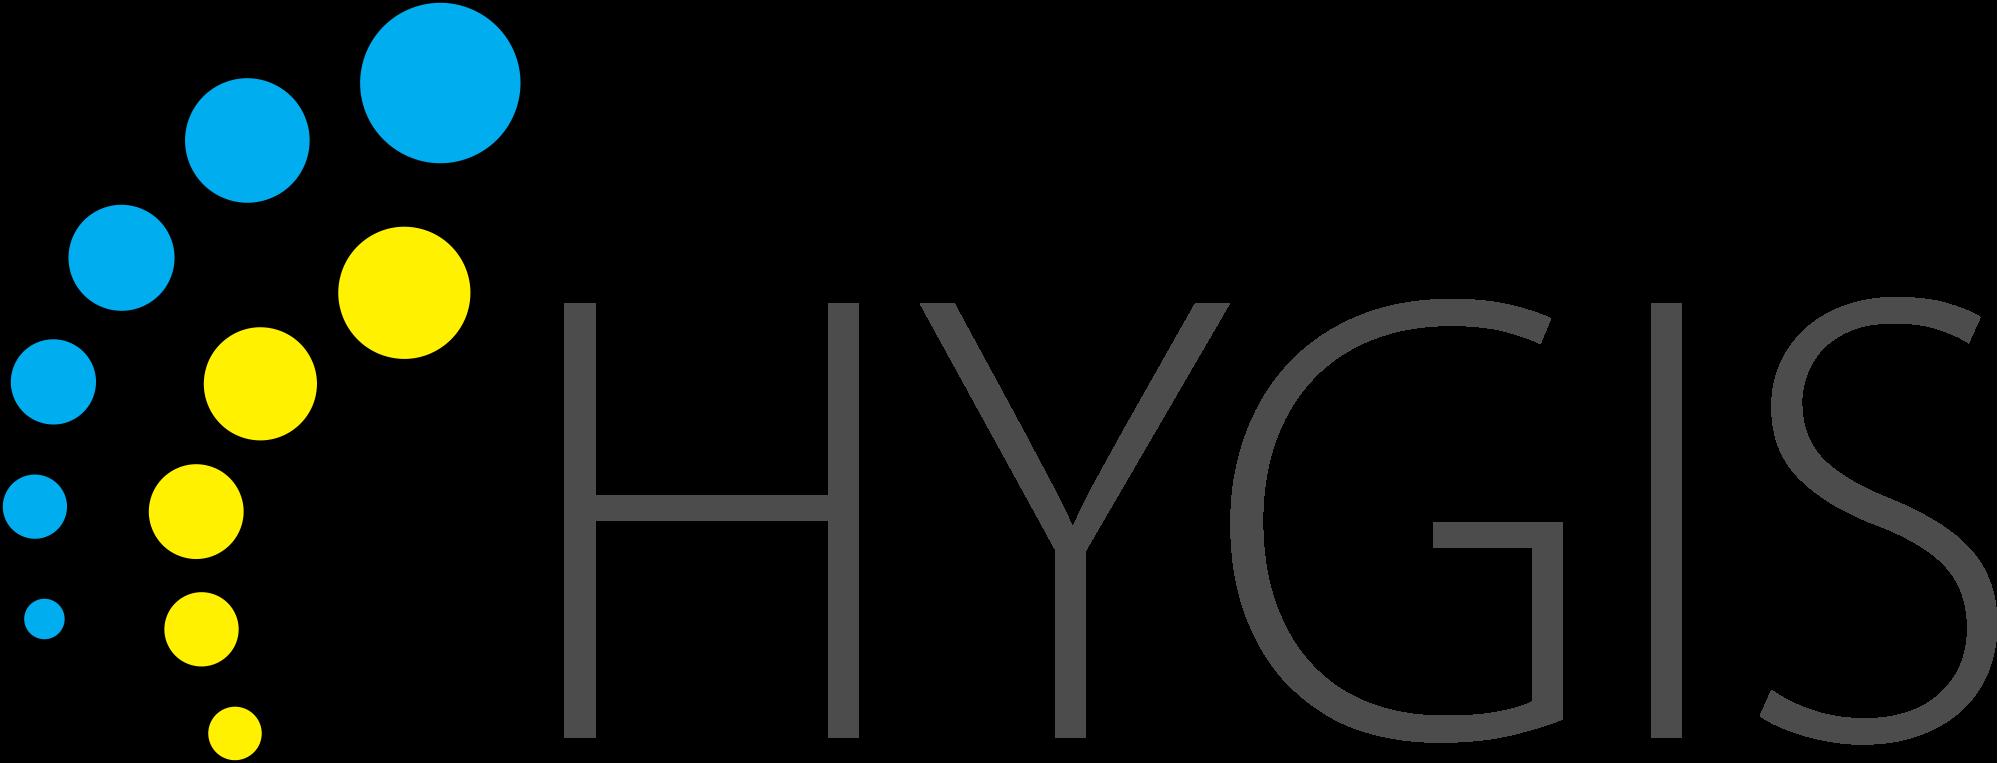 Hygis.sk